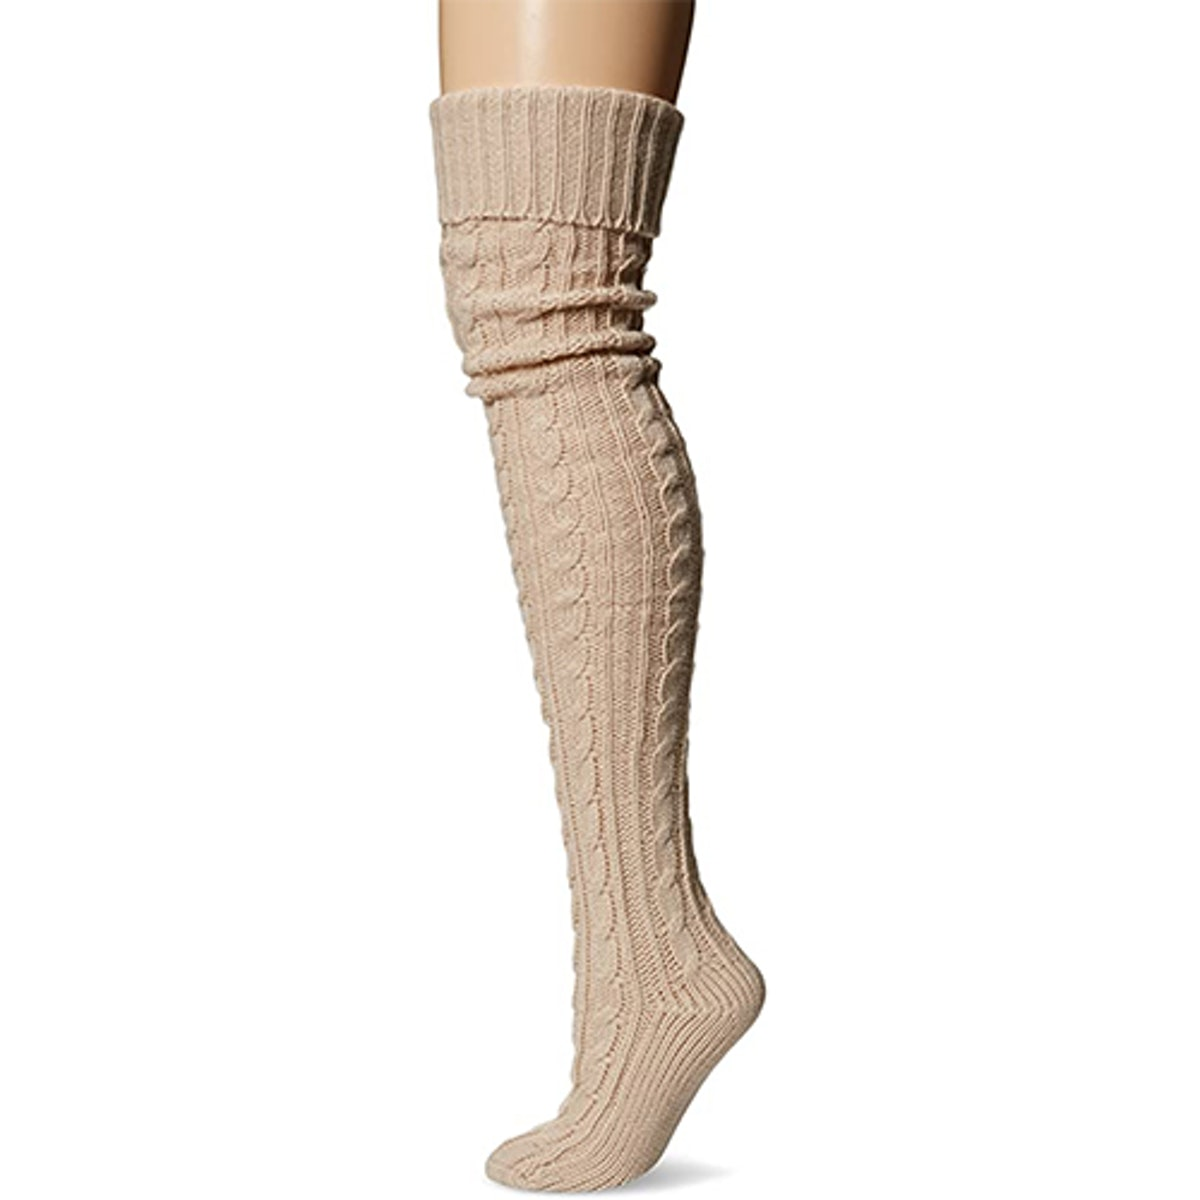 Muk Luks Knee High Cable Socks (28 Inch)